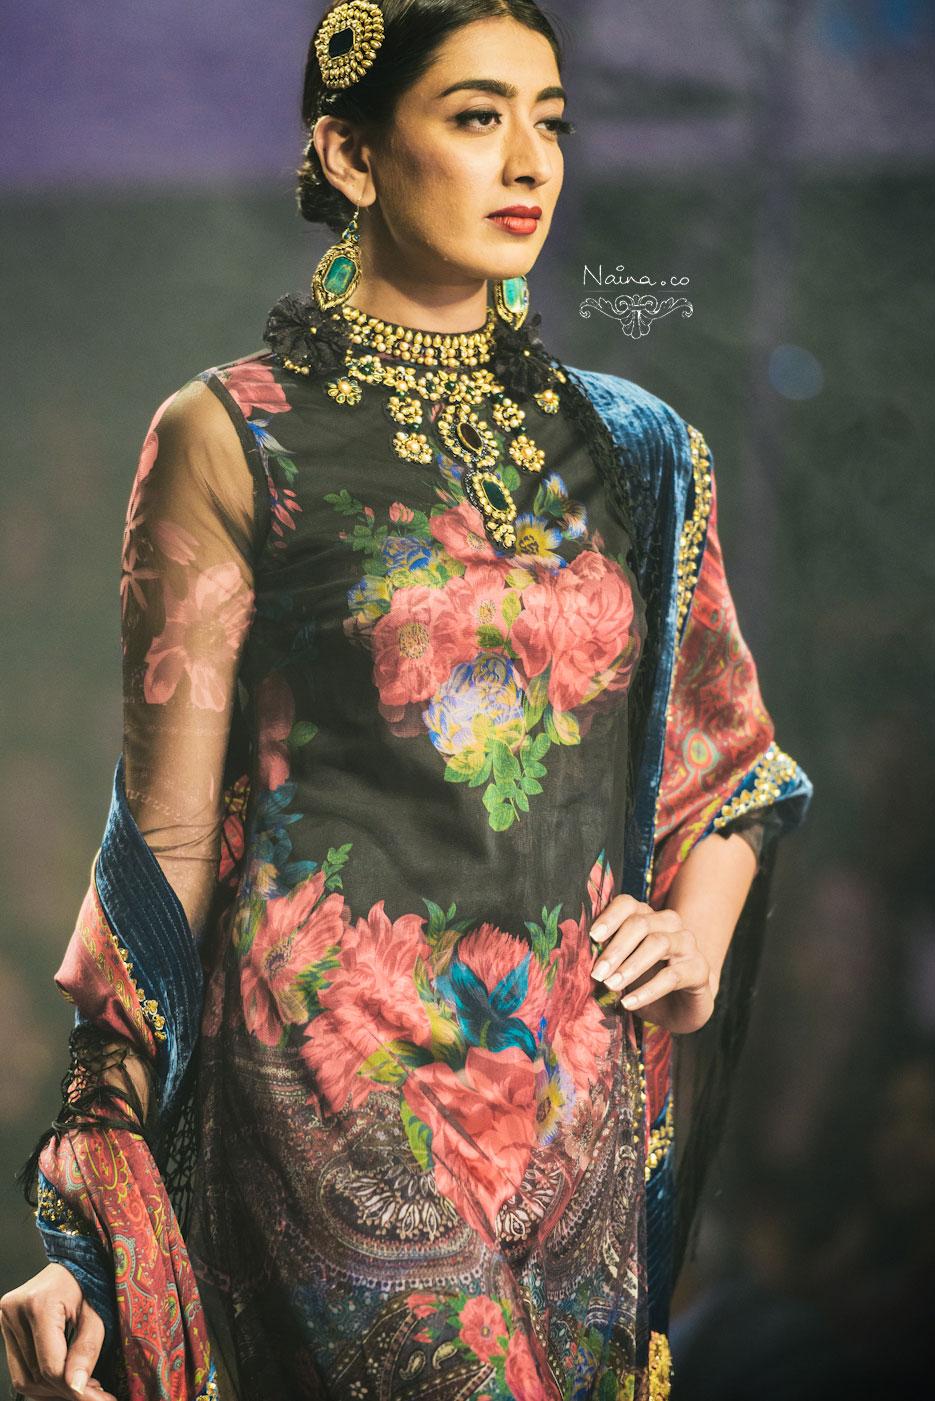 Wills Lifestyle India Fashion Week, Spring Summer 2013. Ritu Kumar Grand Finale by photographer Naina Redhu of Naina.co